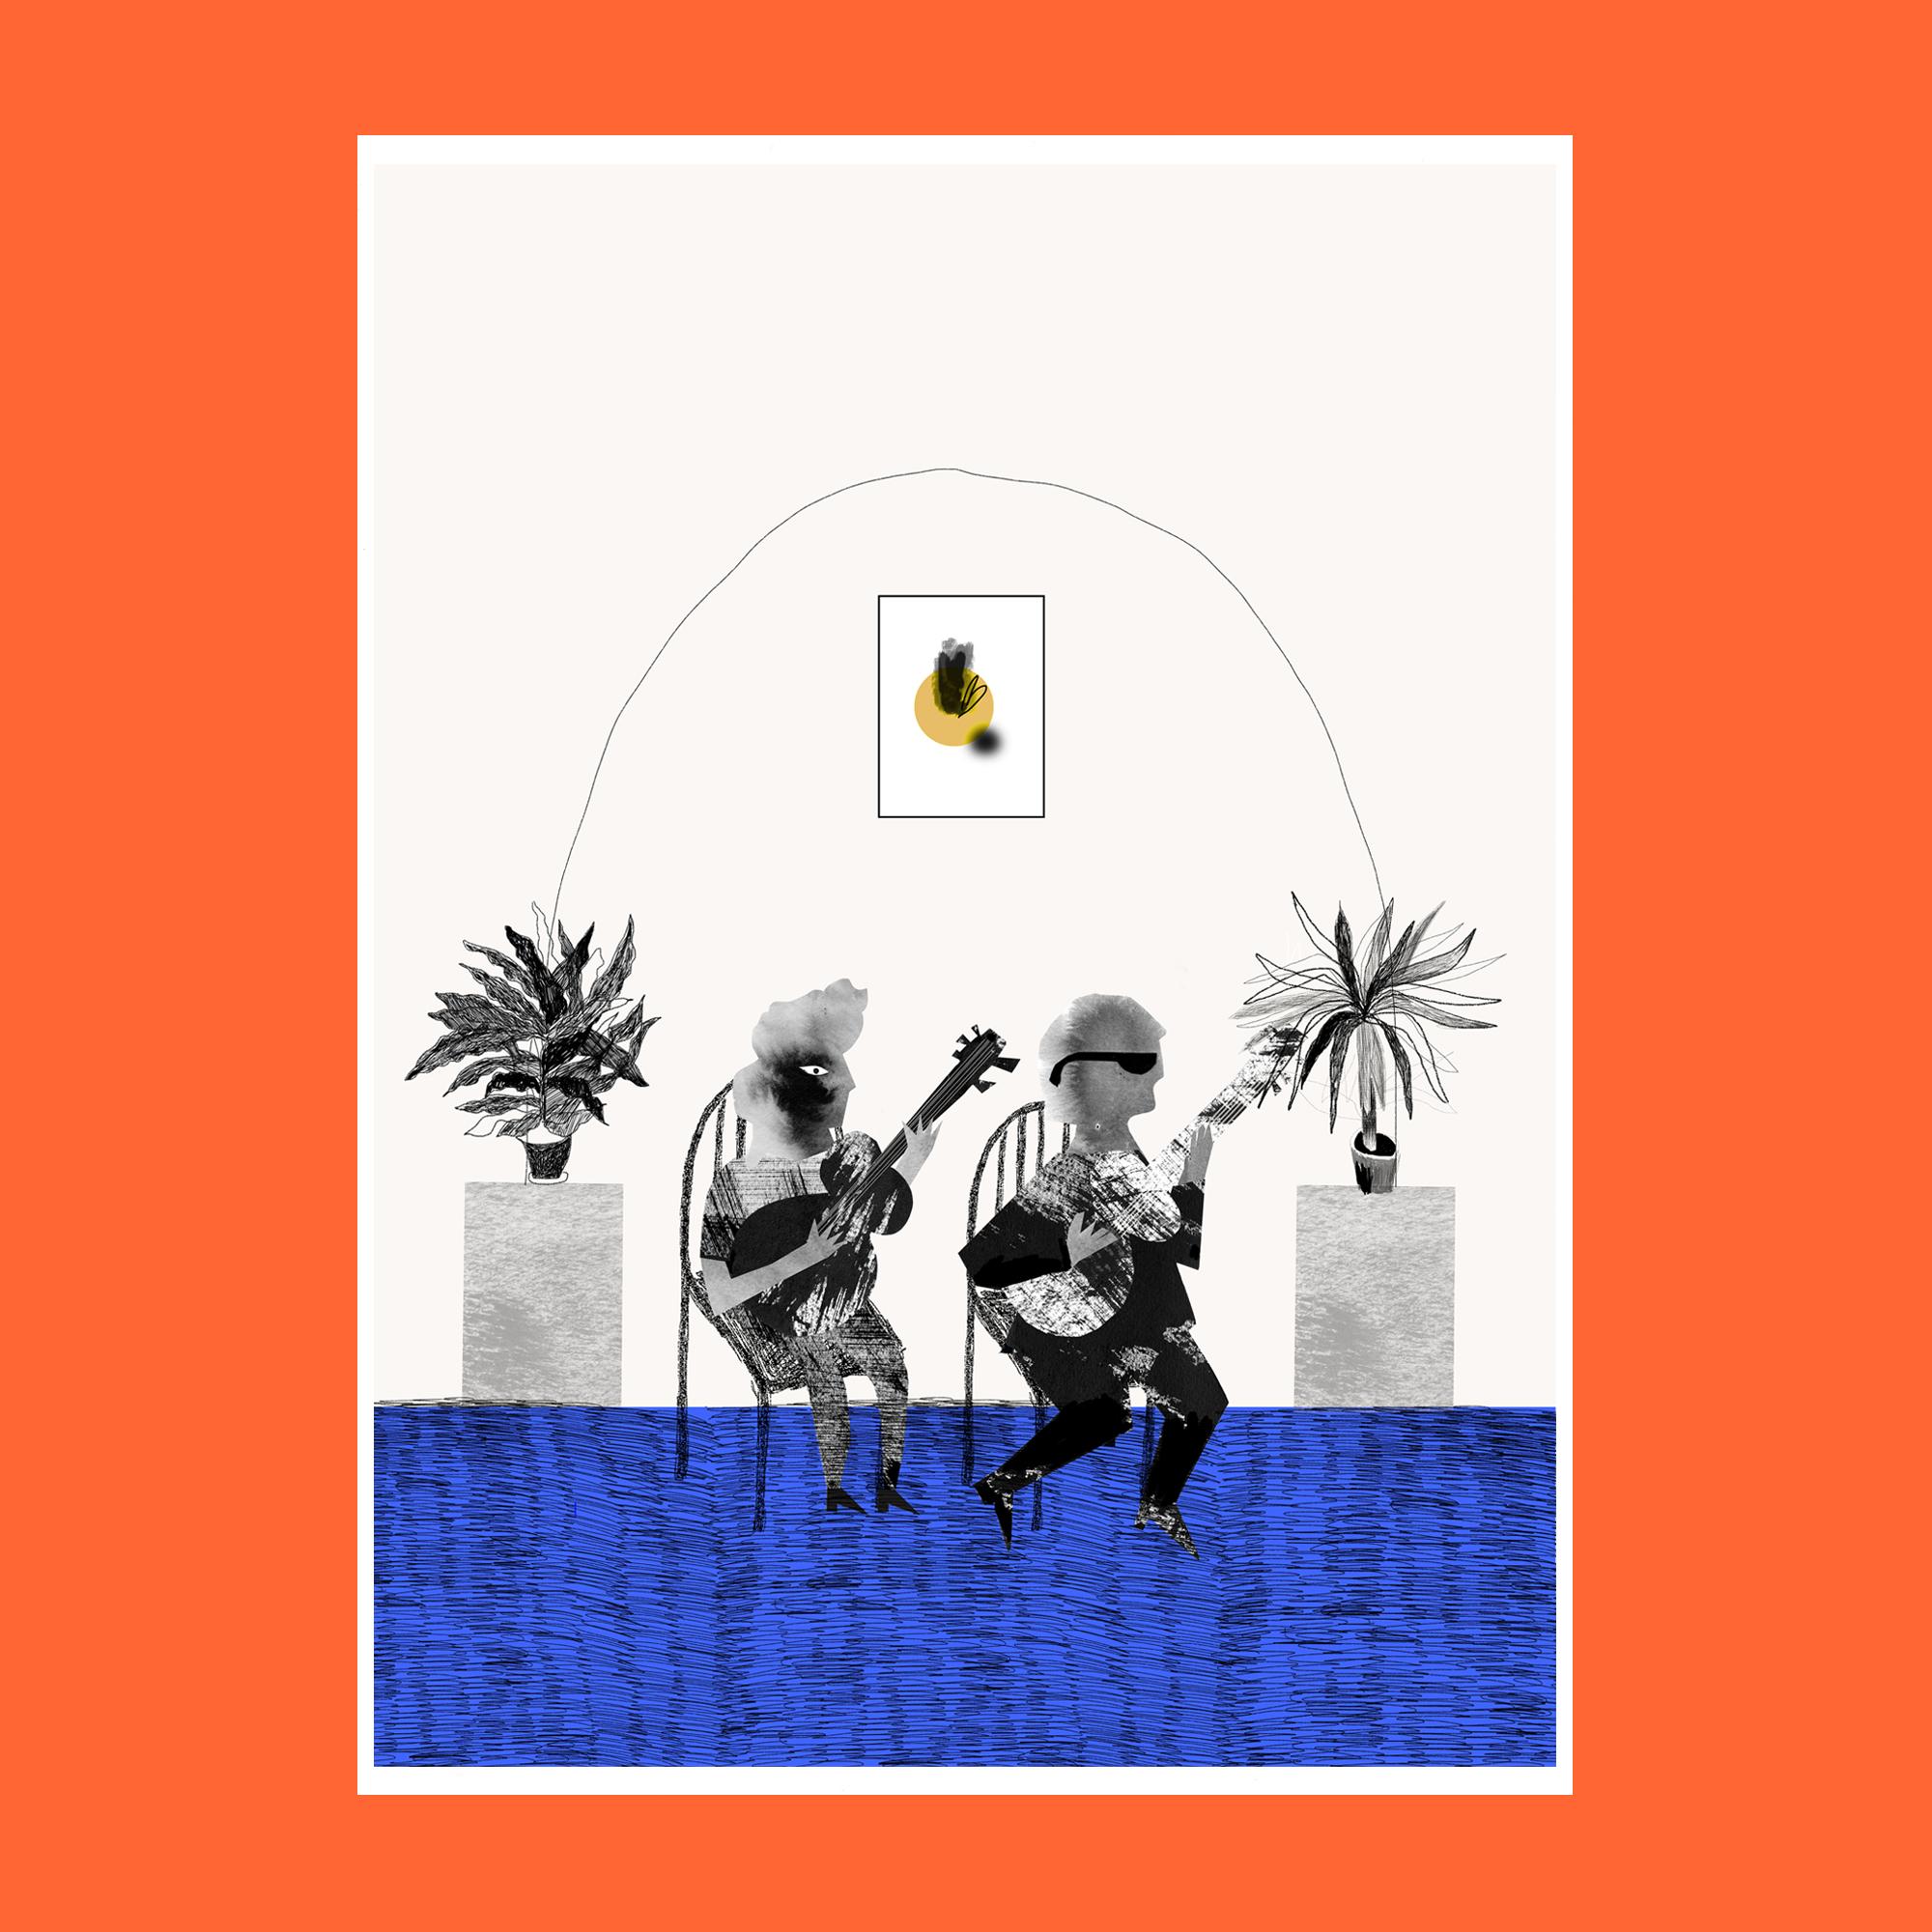 Grace Attlee, Grace Attlee illustration, illustrator, collage, screen print, Margate illustrator, riso